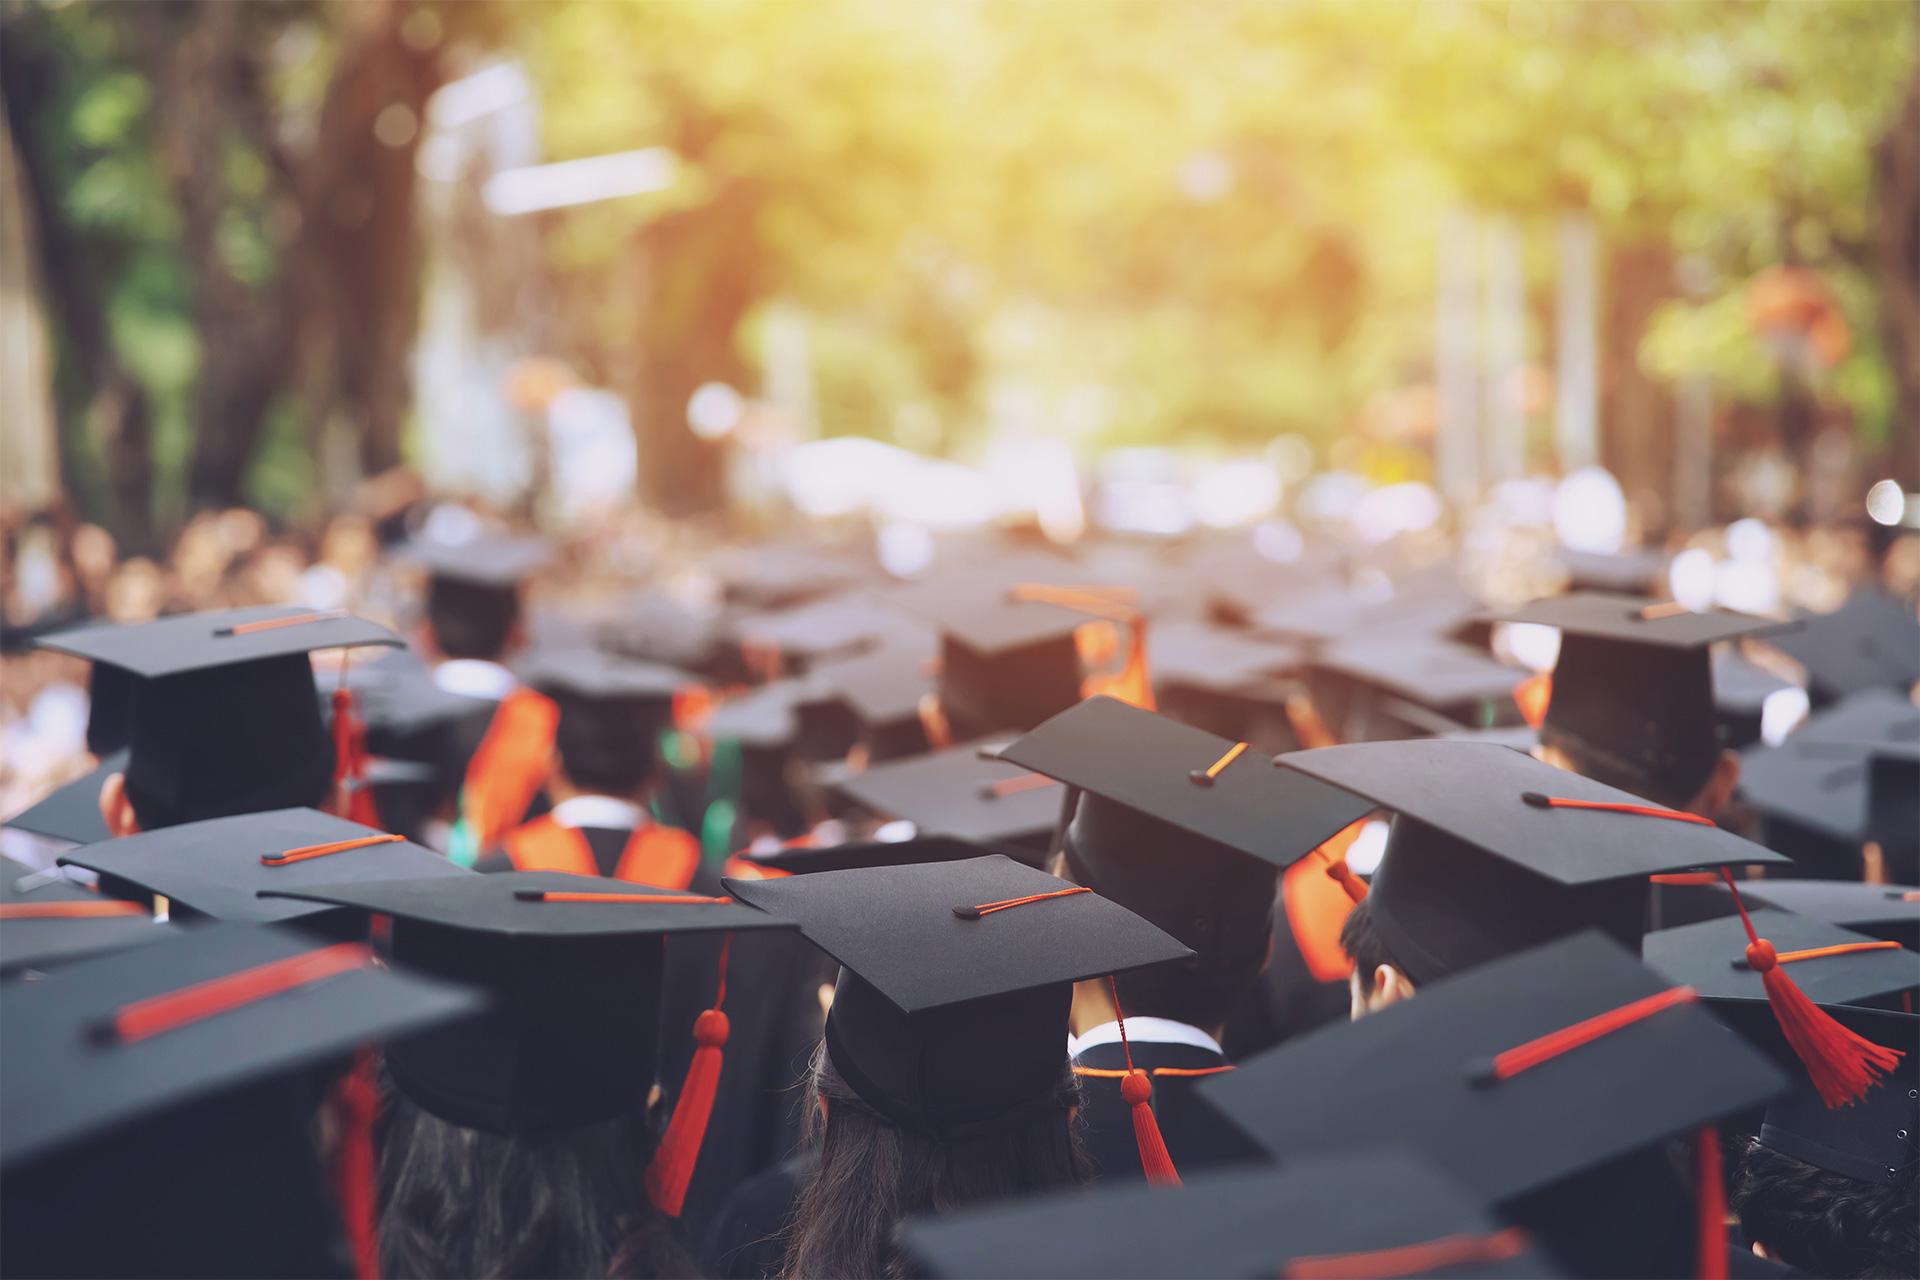 backside graduation hats during commencement success graduates o